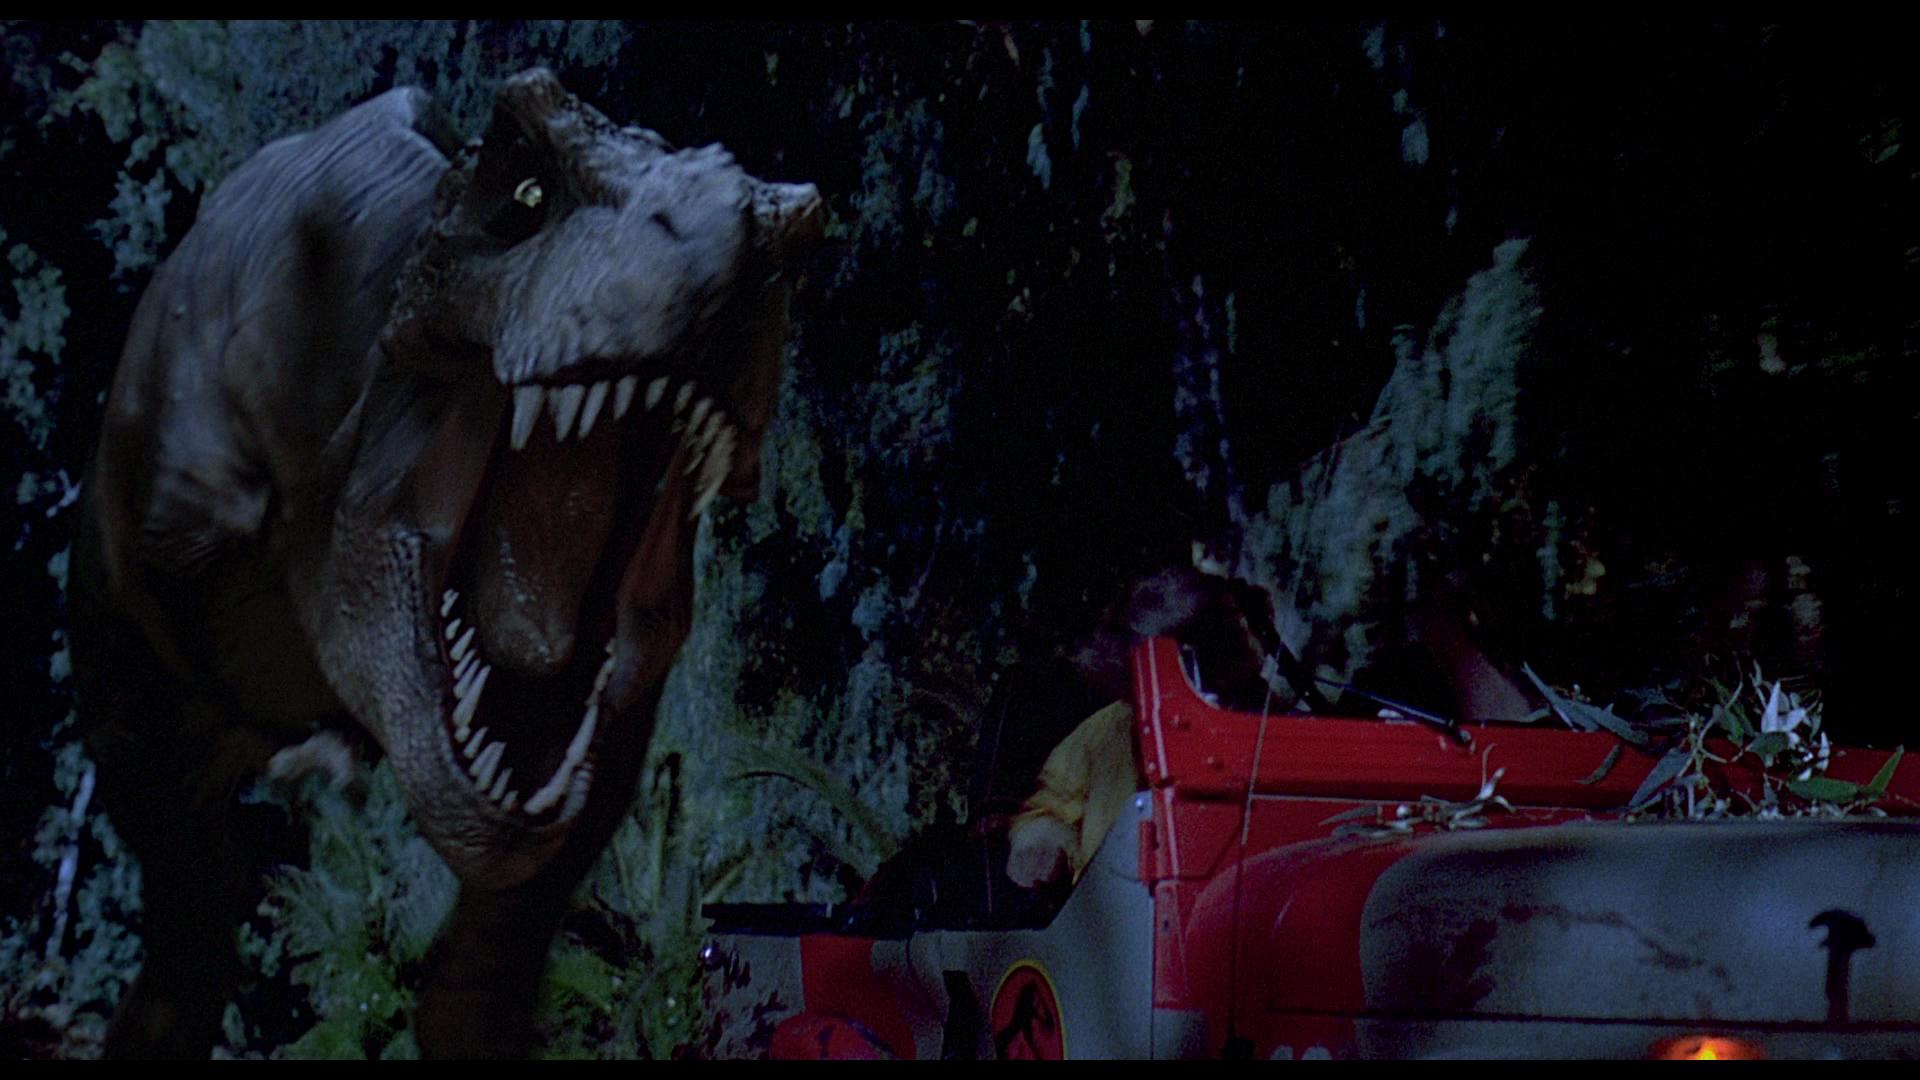 Tyrannosaurus Rex Jurassic Park Wallpaper 6905 Radiotimes